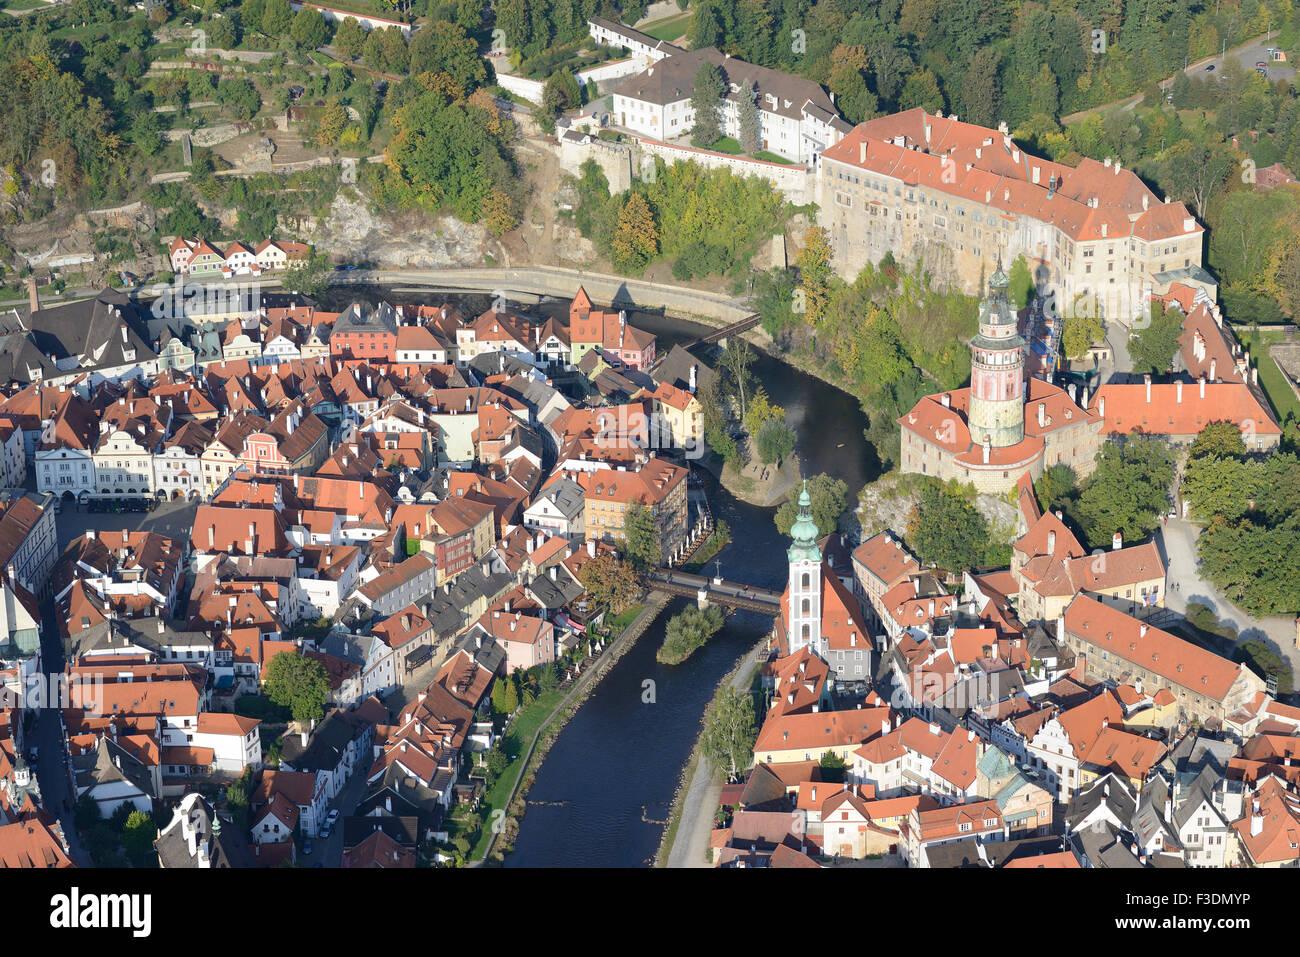 CASTLE OVERLOOKING THE MEDIEVAL CITY AND THE VLTAVA RIVER (aerial view). Ceský Krumlov, Bohemia, Czech Republic. - Stock Image